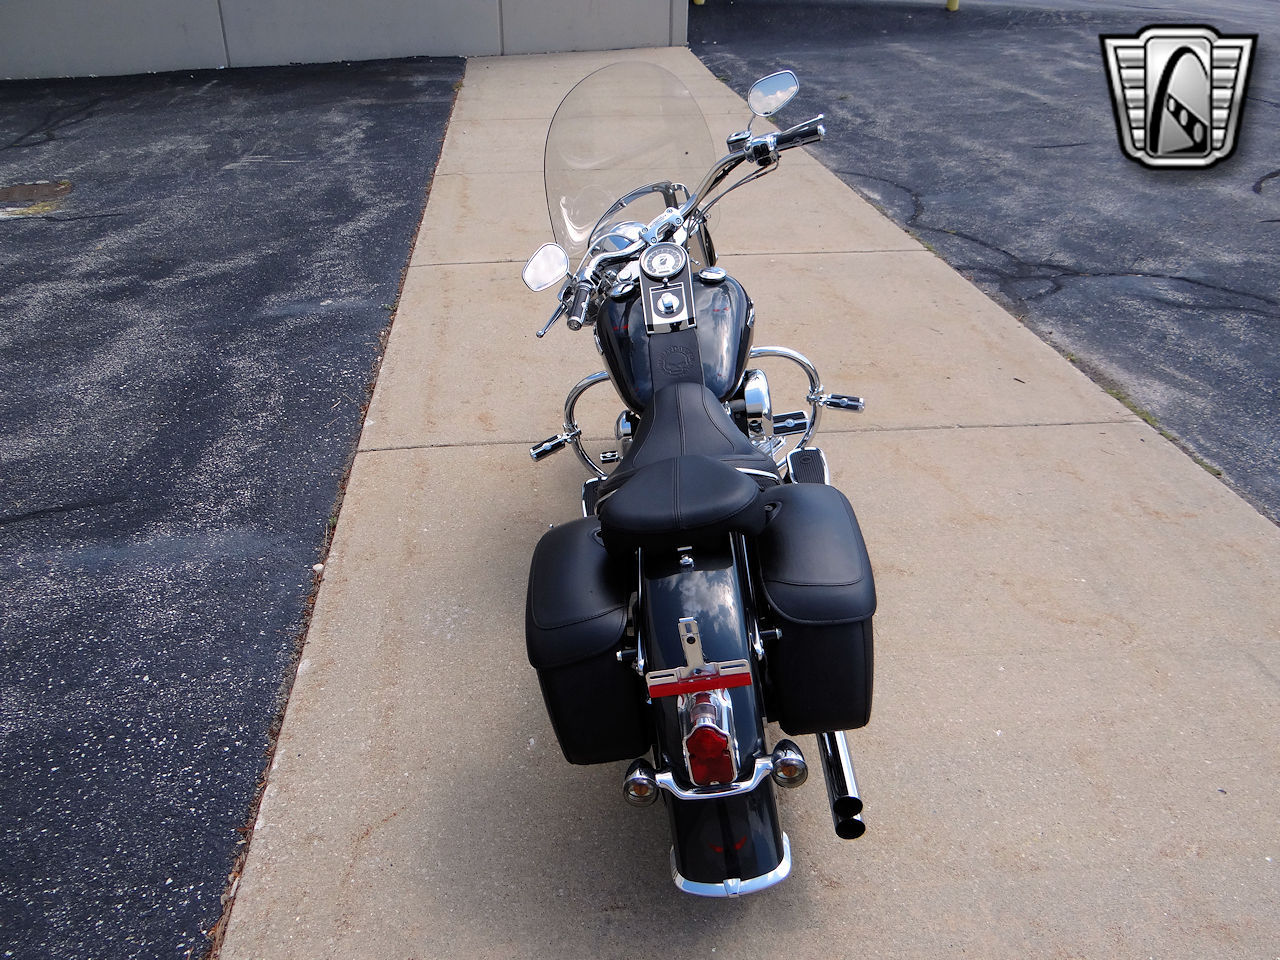 2006 Harley Davidson FLSTNI 29